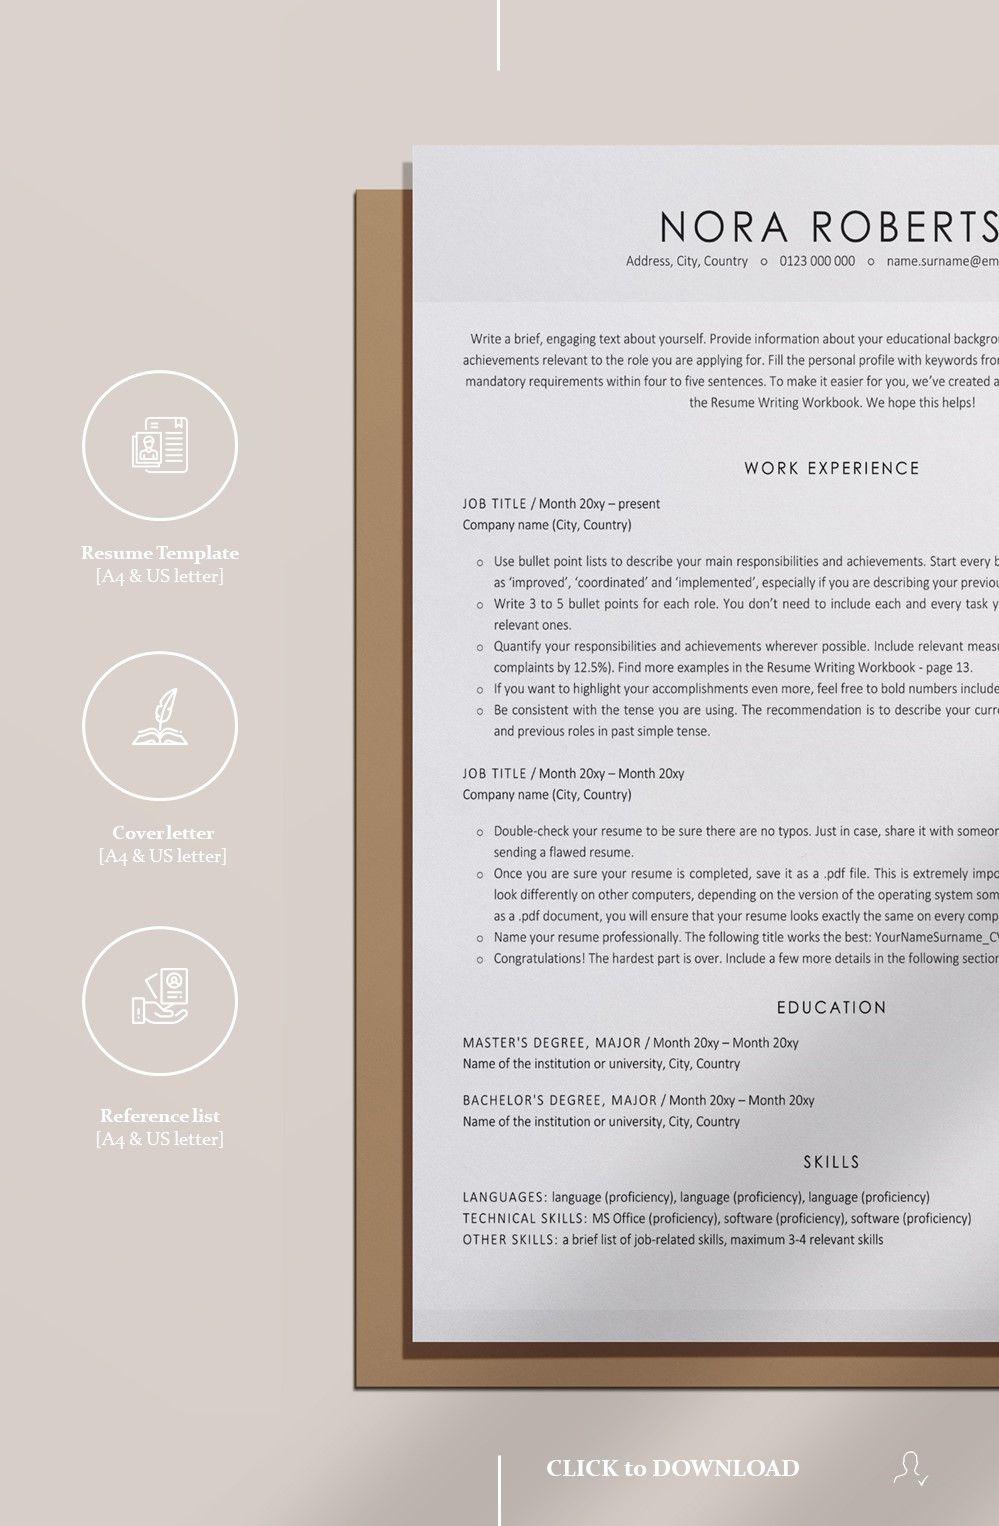 Minimalist Resume Template Ats Friendly Resume Professional Cv Template Modern Cv Executive Resume Template Minimalist Resume Template Cover Letter Template